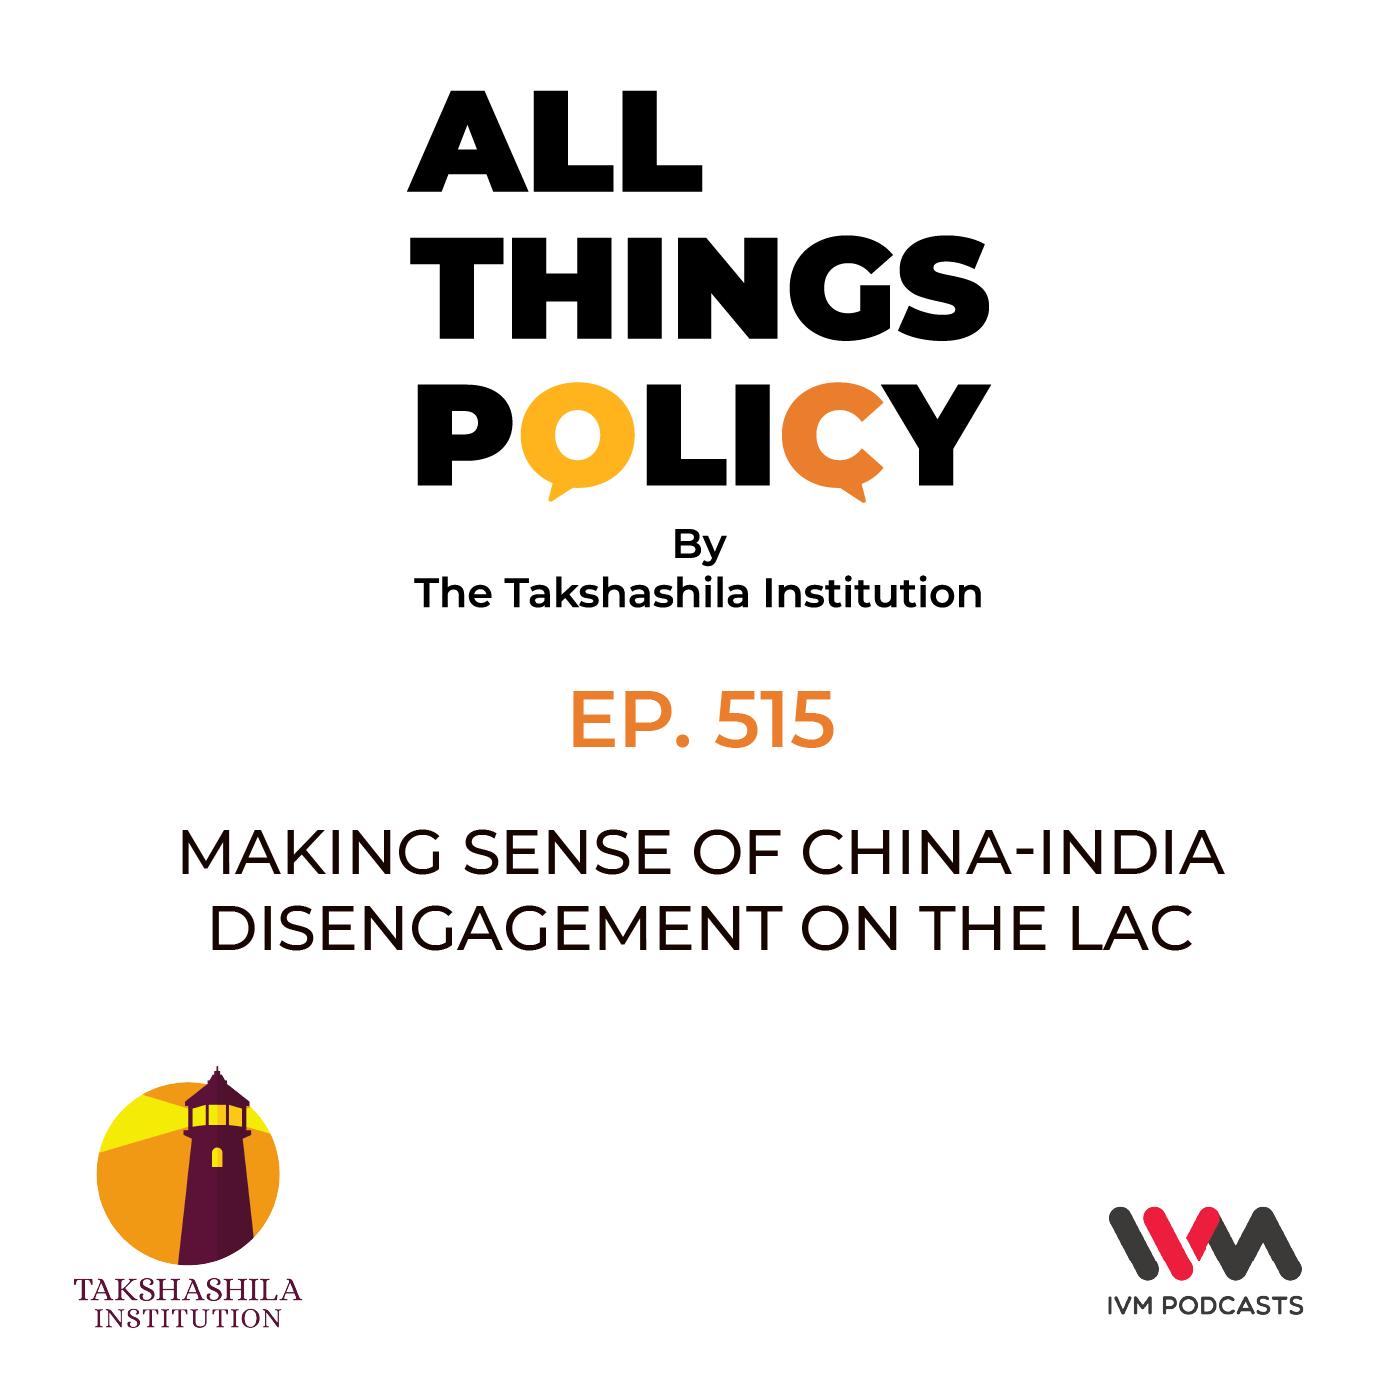 Ep. 515: Making sense of China-India disengagement on the LAC